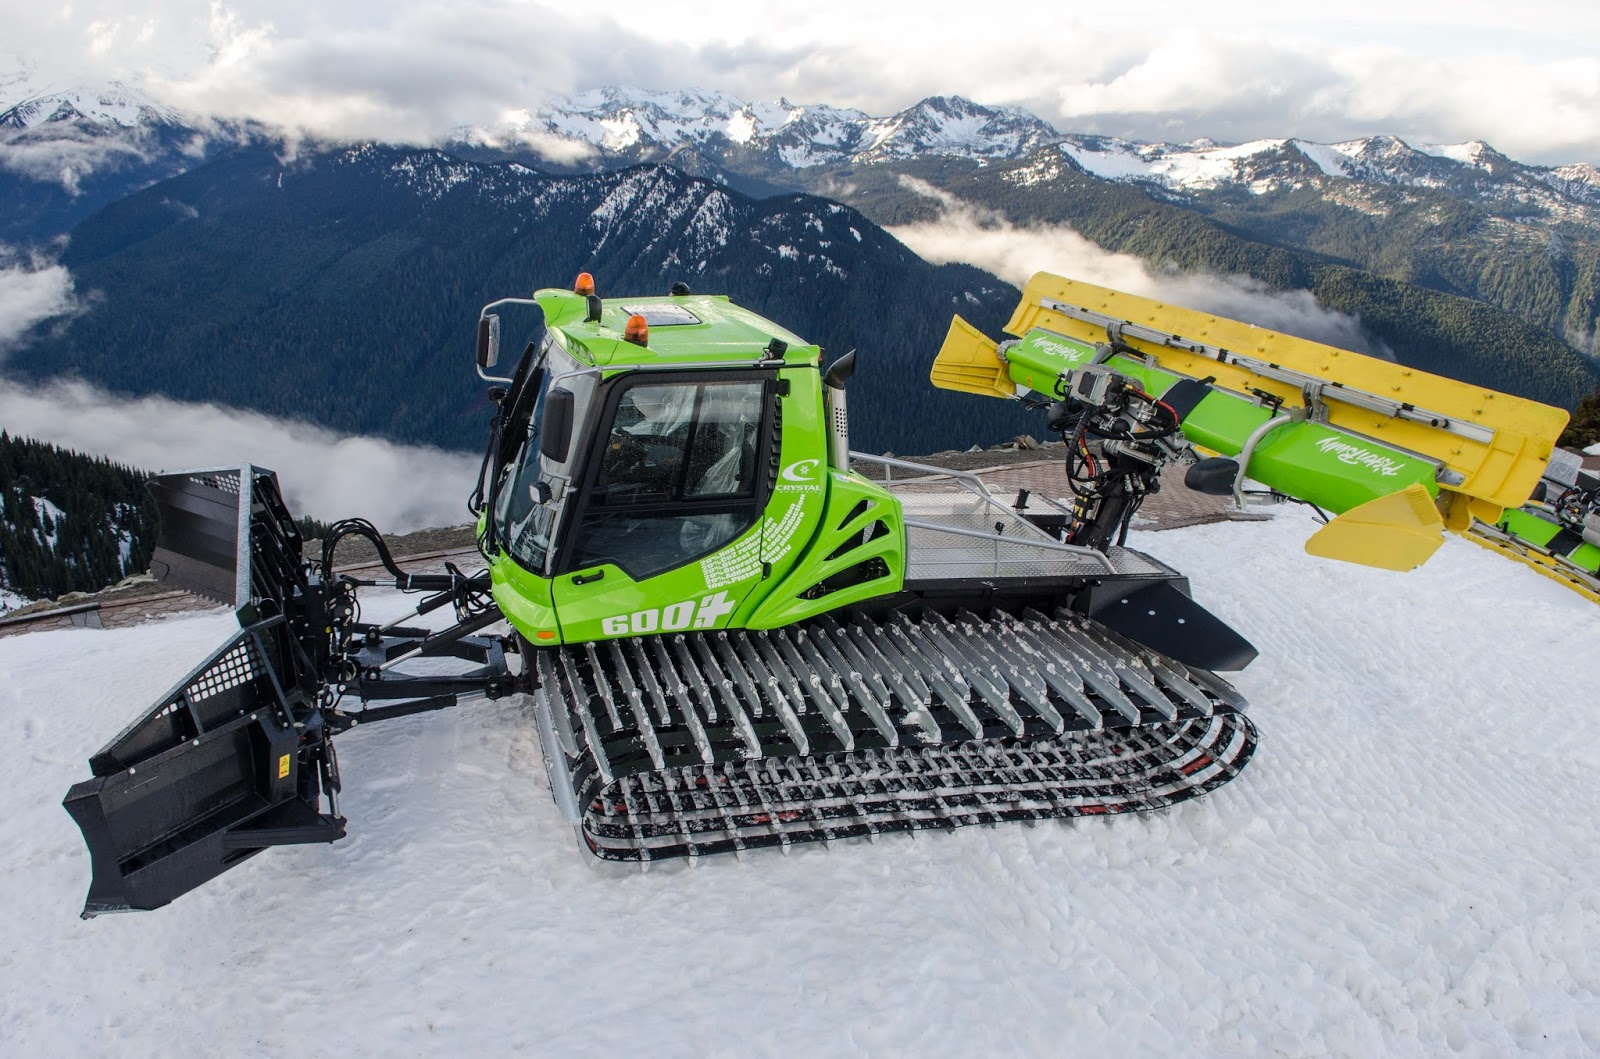 Electric And Hybrid Vehicles >> Northwest Snowcats: PistenBully by Kassbohrer All Terrain Vehicles Alaska Washington Oregon